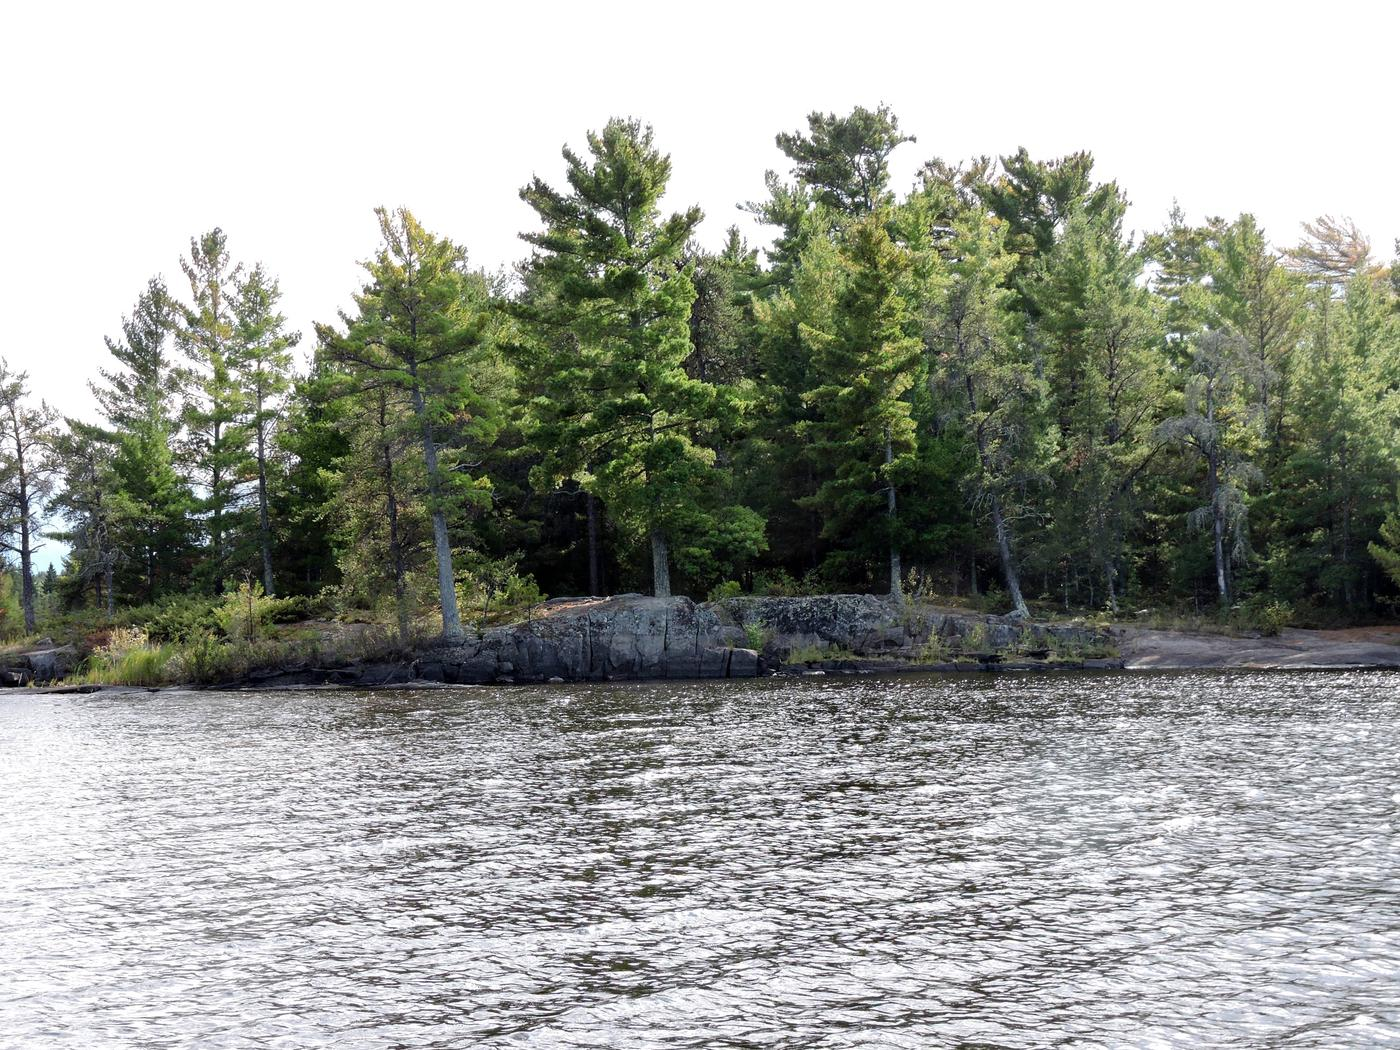 R1 - Alder CreekR1 - Alder Creek campsite on Rainy Lake